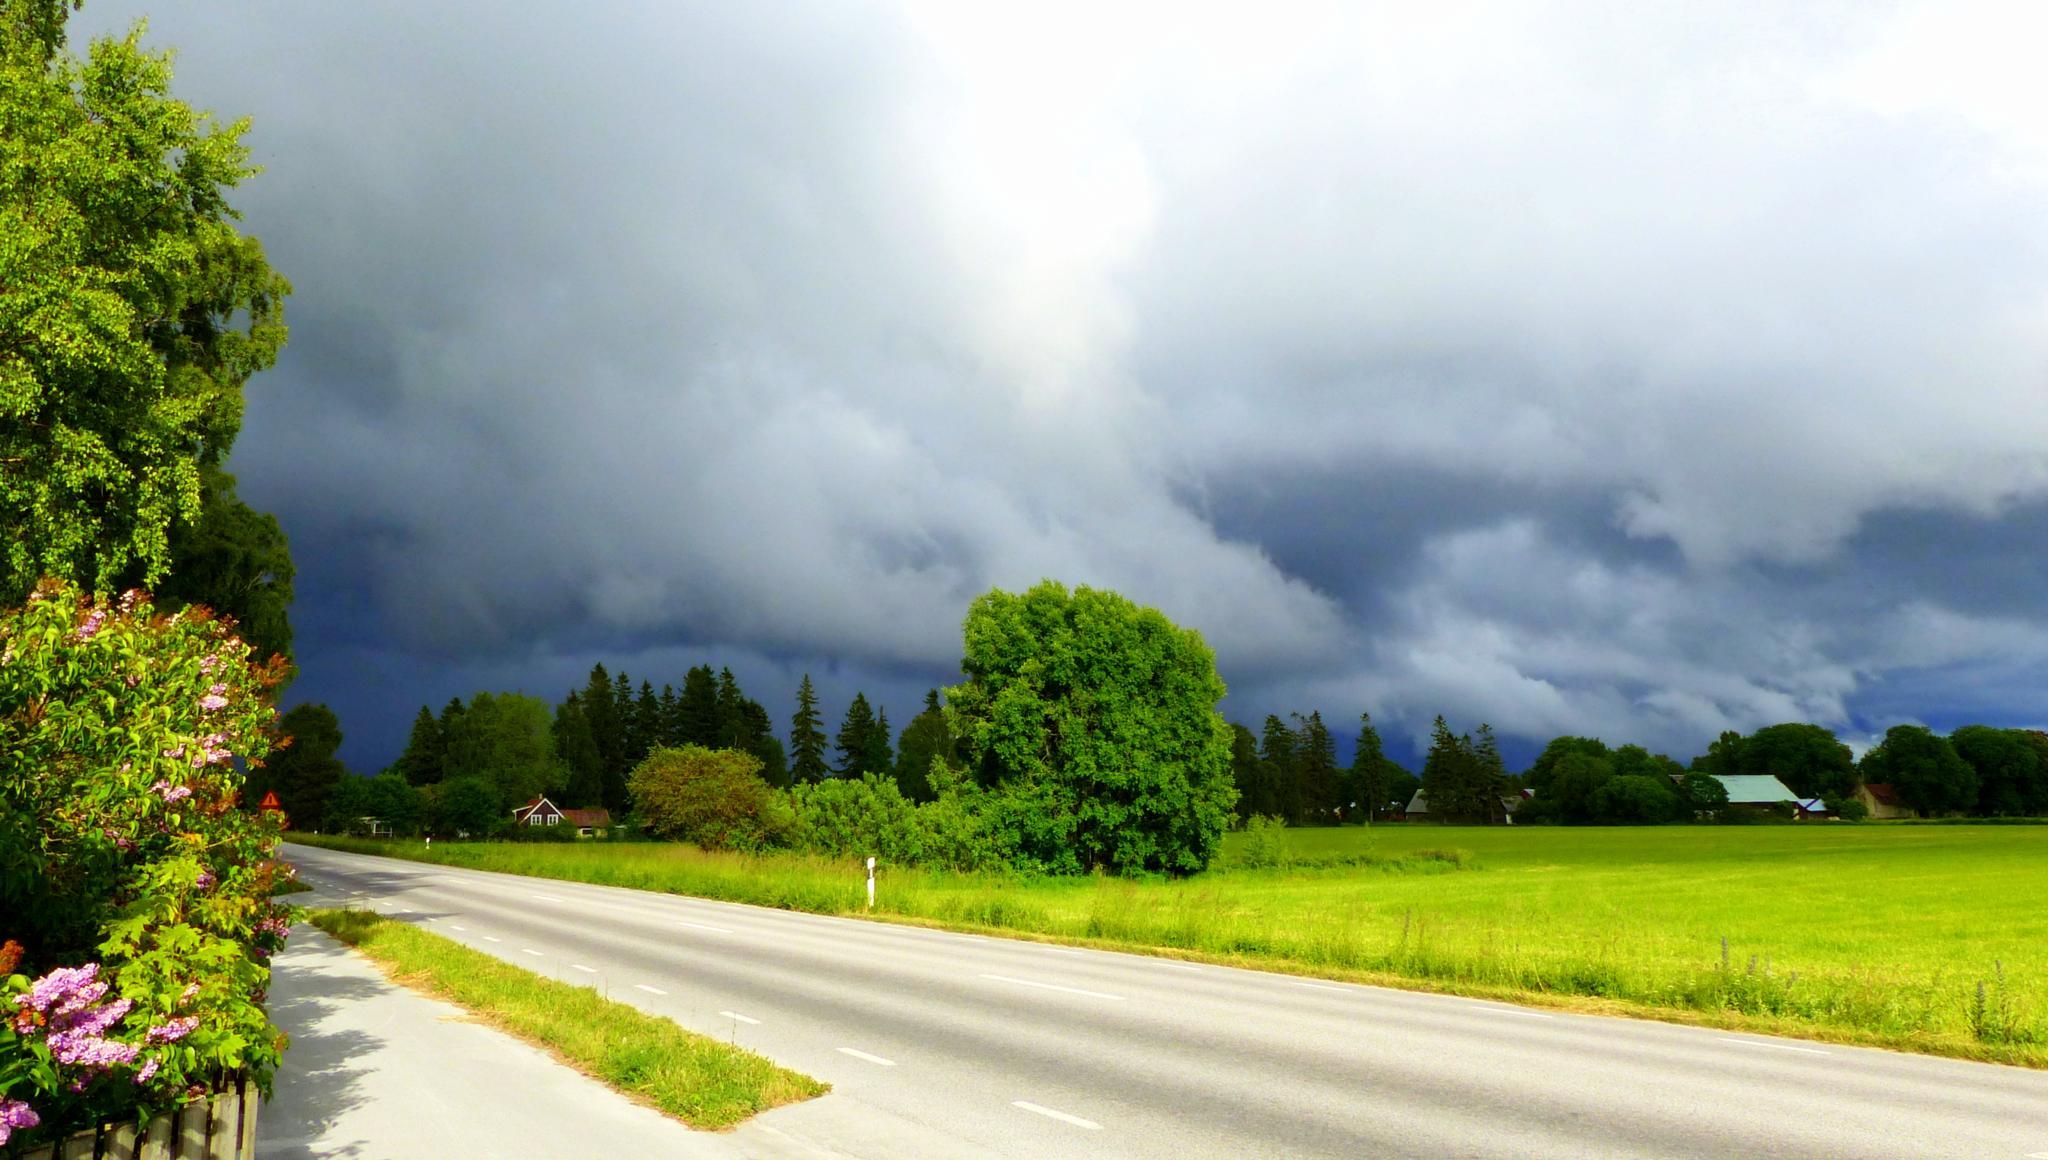 After sun there's rain by maja.e.olin